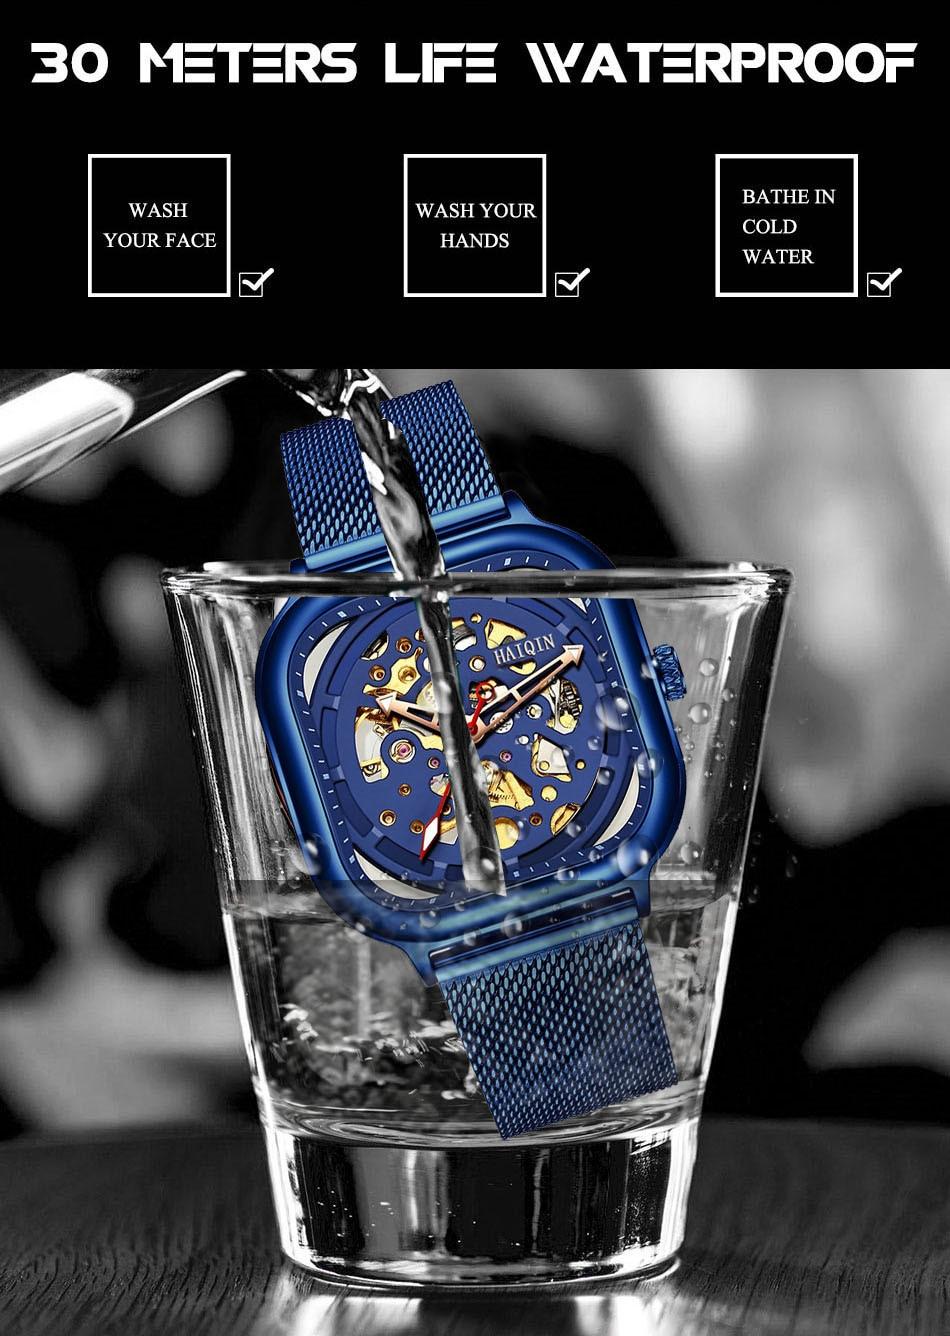 Hee51693c821f4f9aa9ec6ed87ba475dd7 HAIQIN 2019 Fashion Mechanical mens watches top brand luxury sport wristwatch men waterproof Quartz mens clock Relogio Masculino